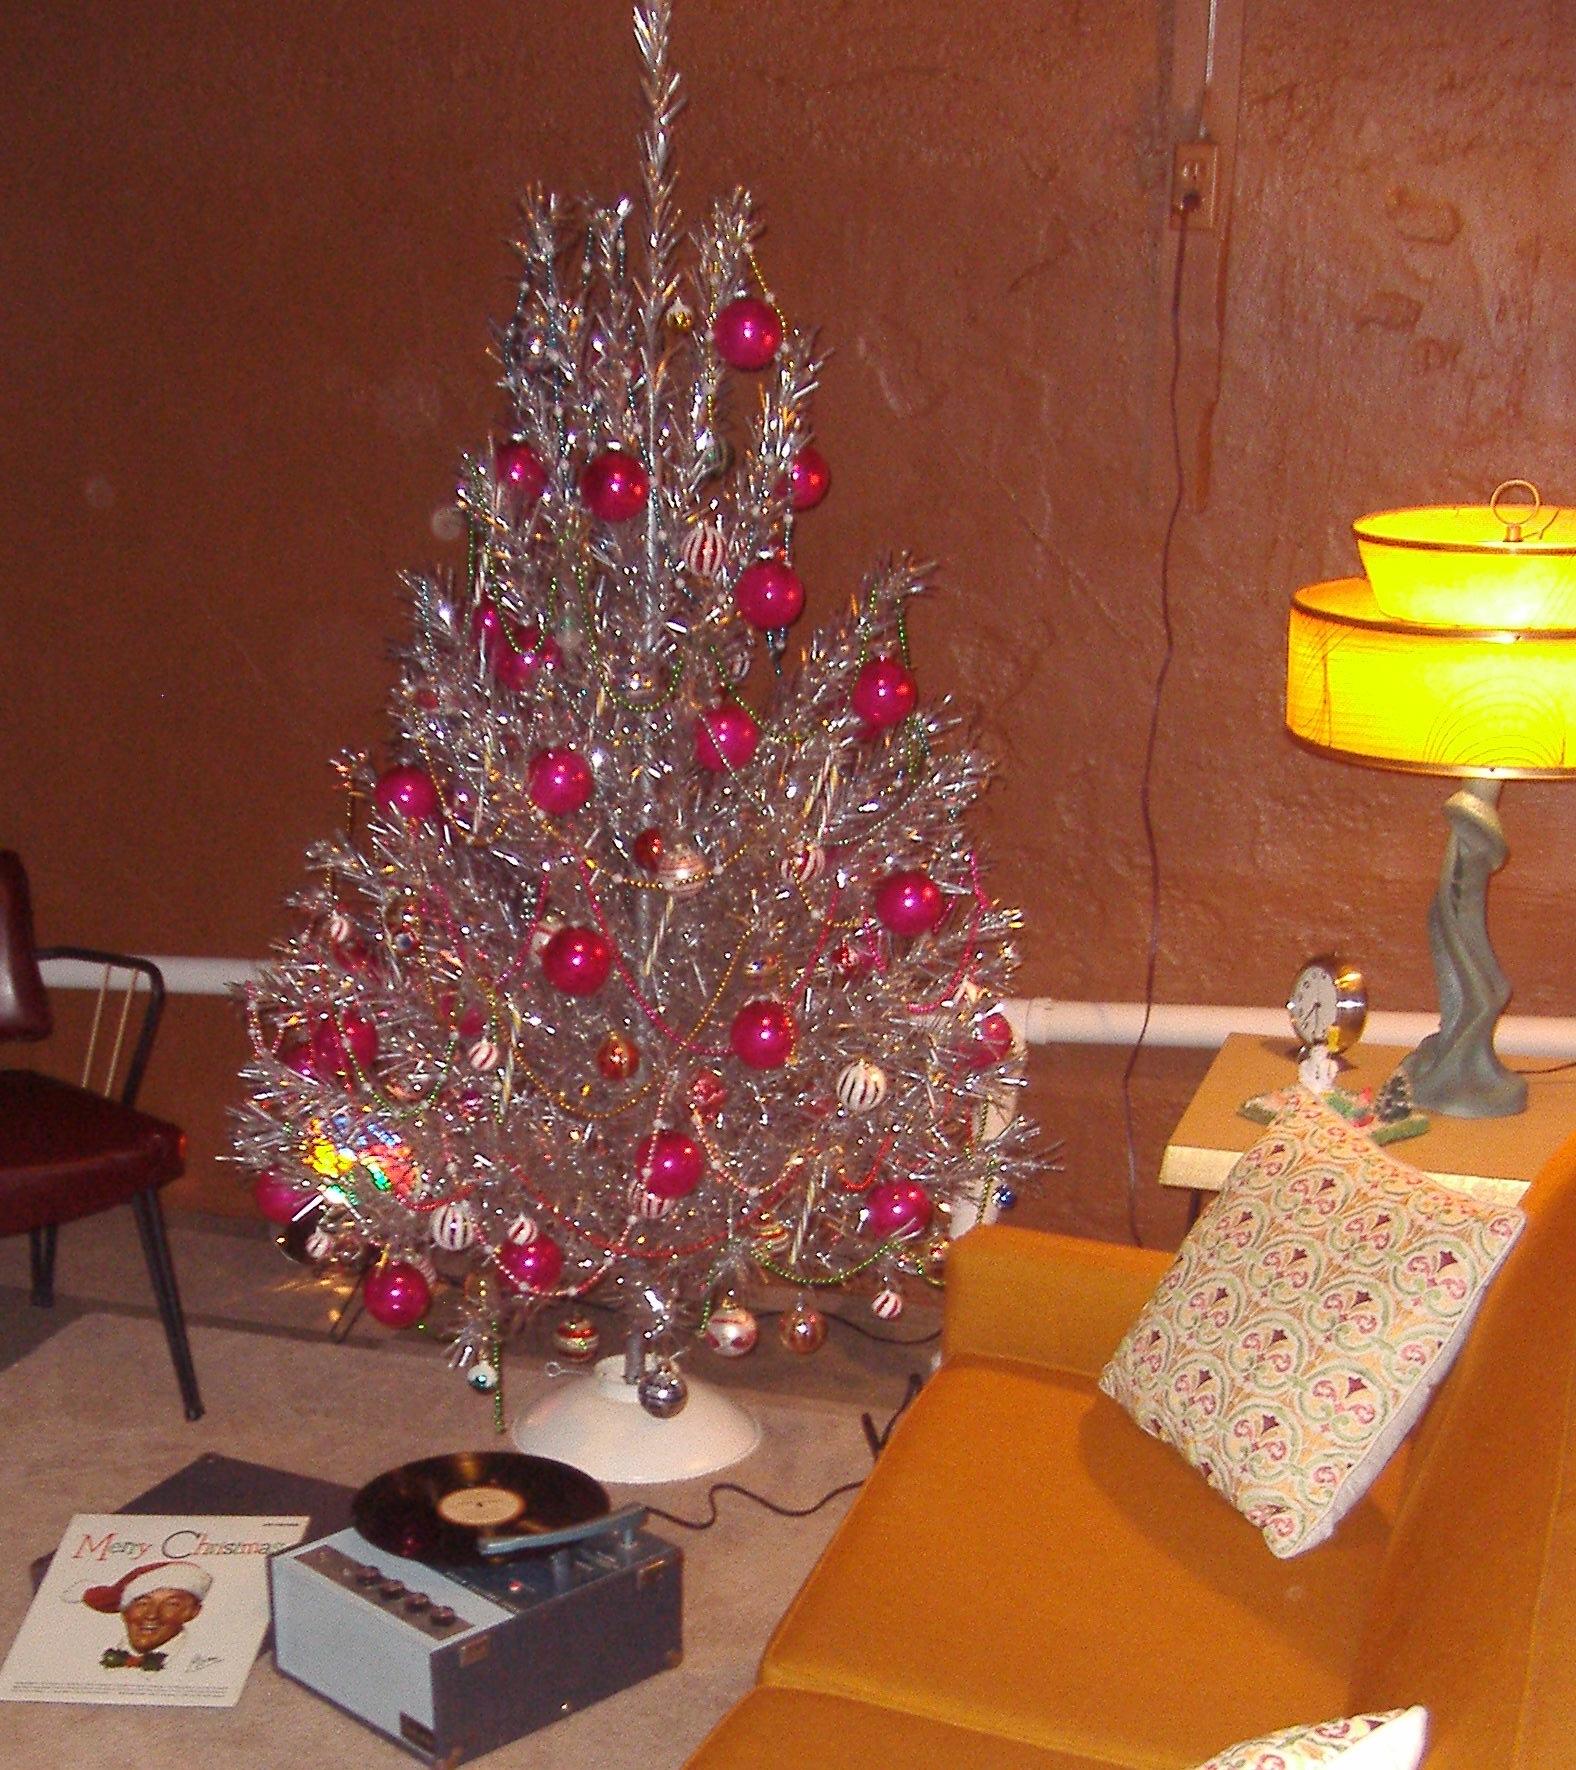 Tinselmania: 221 vintage aluminum Christmas trees - Retro ...